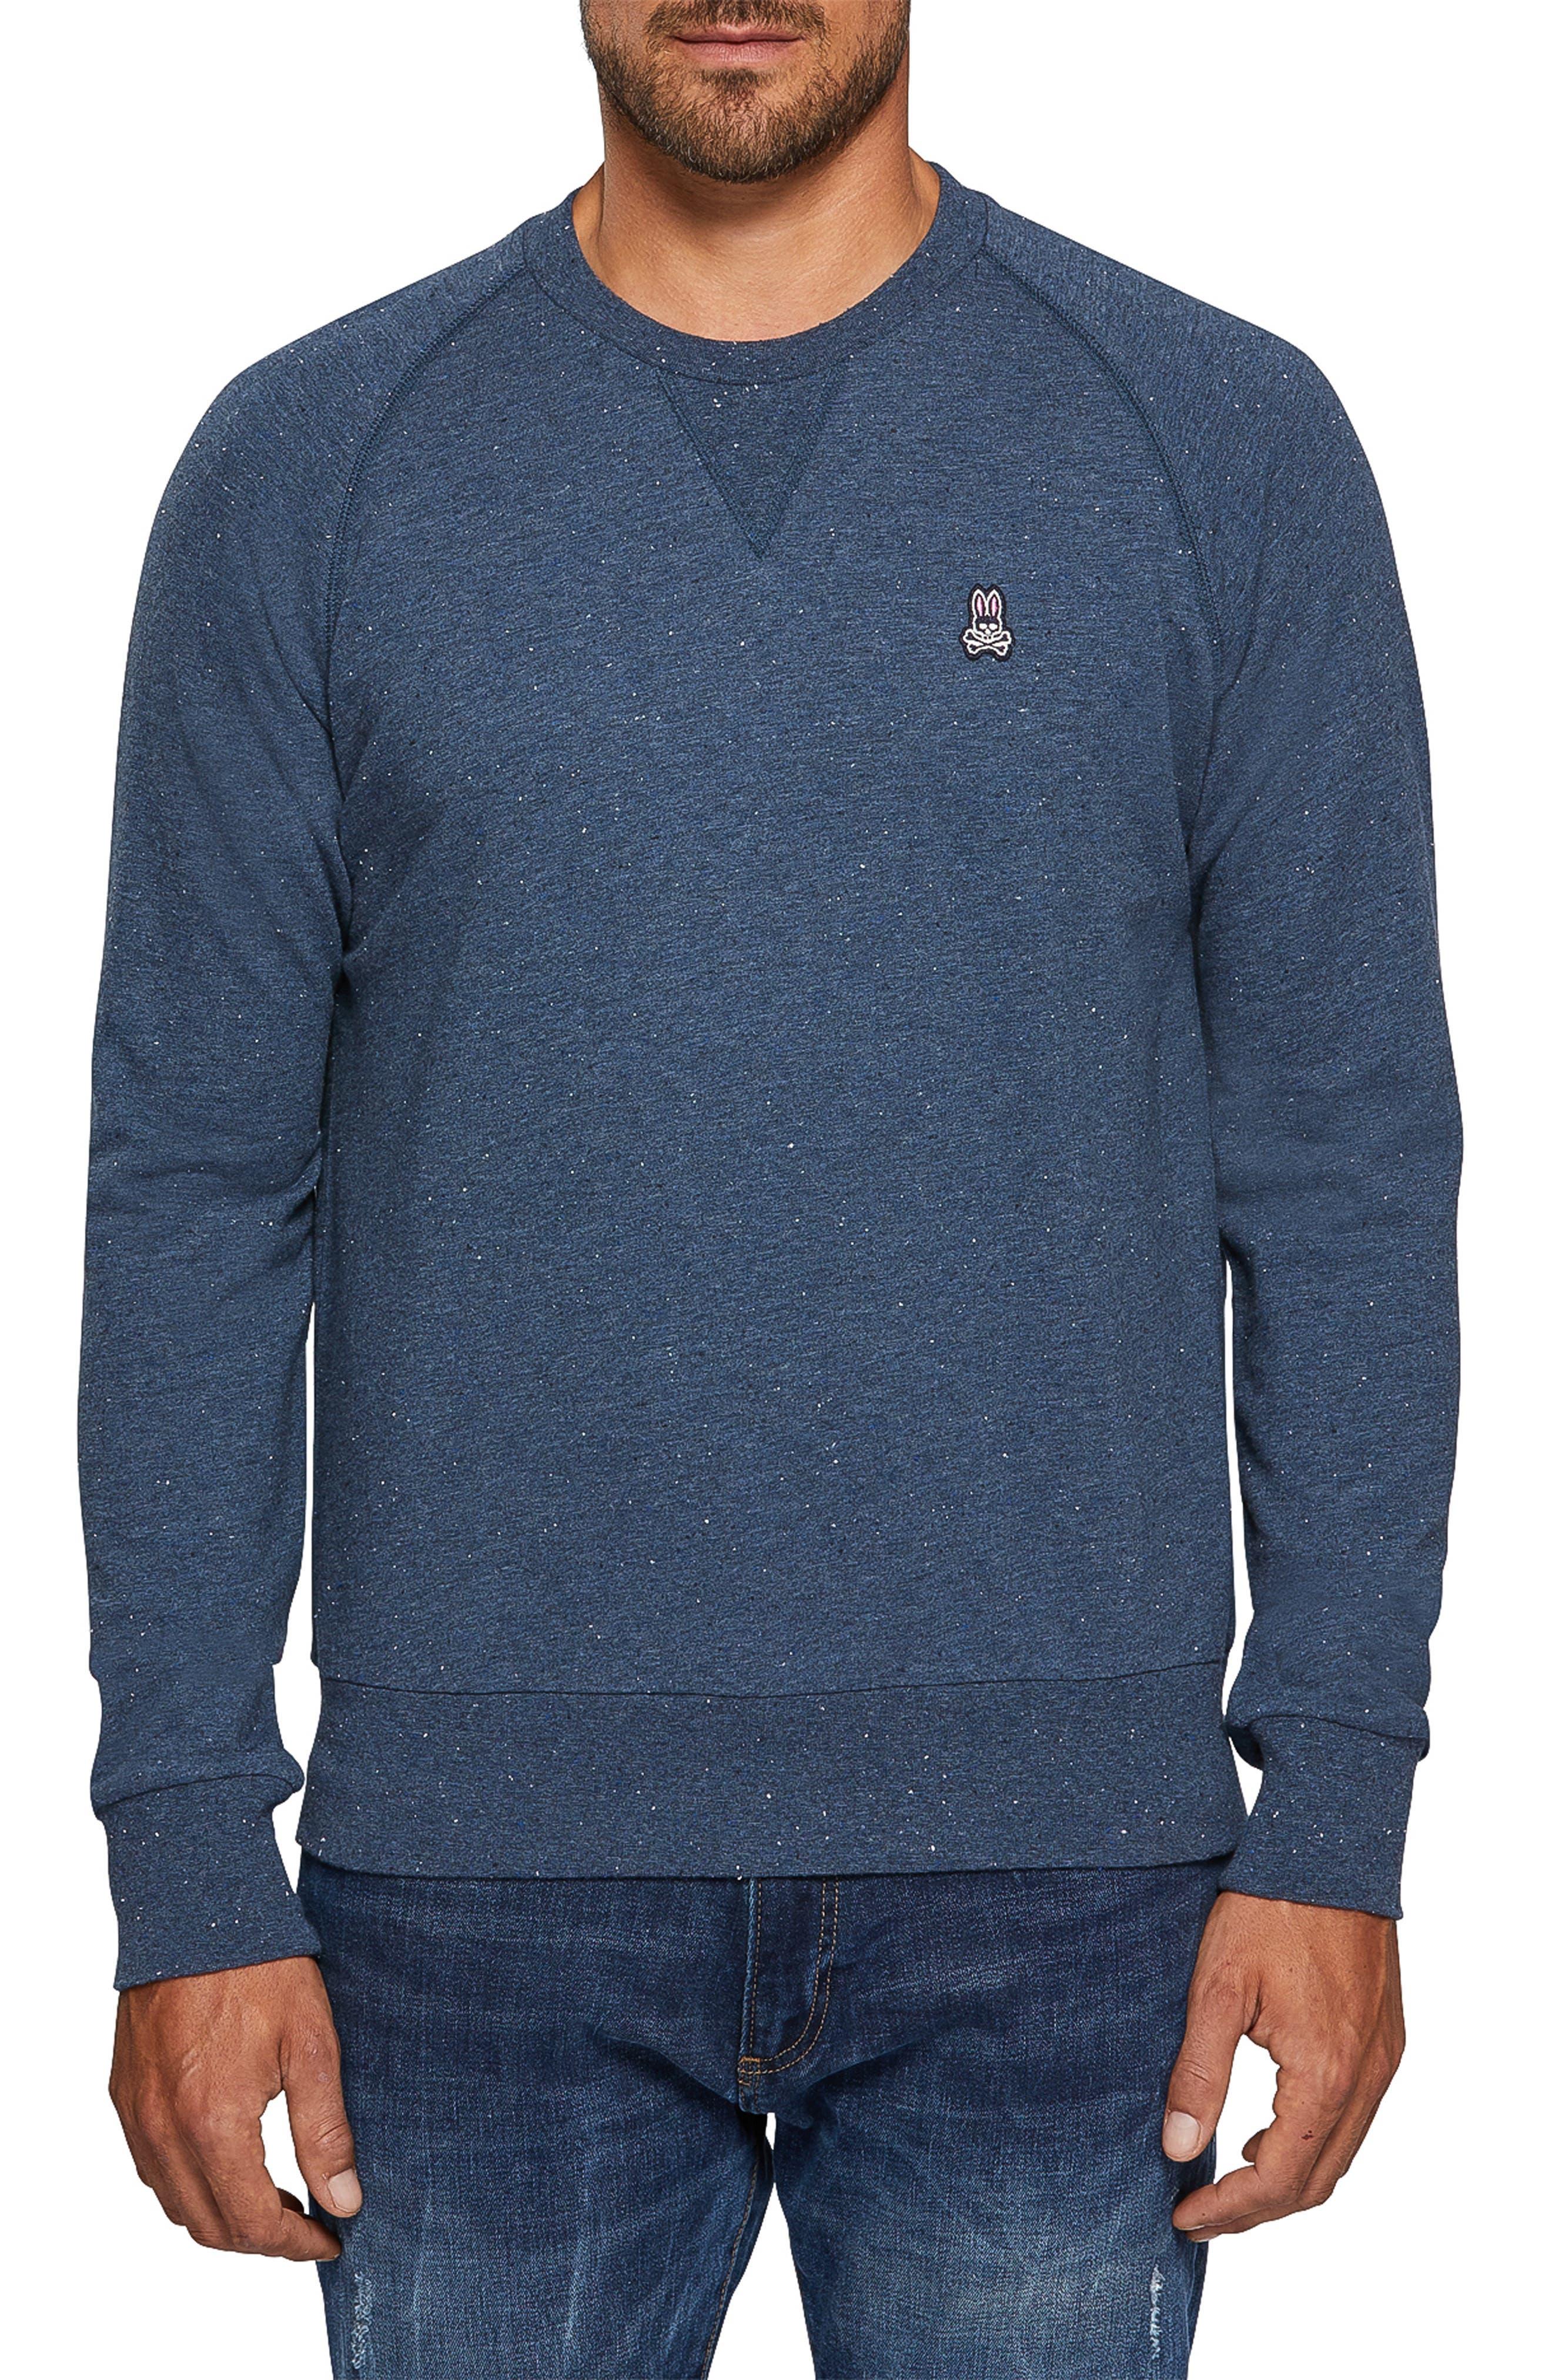 Larne Donegal Crewneck Sweatshirt,                             Main thumbnail 1, color,                             GULF